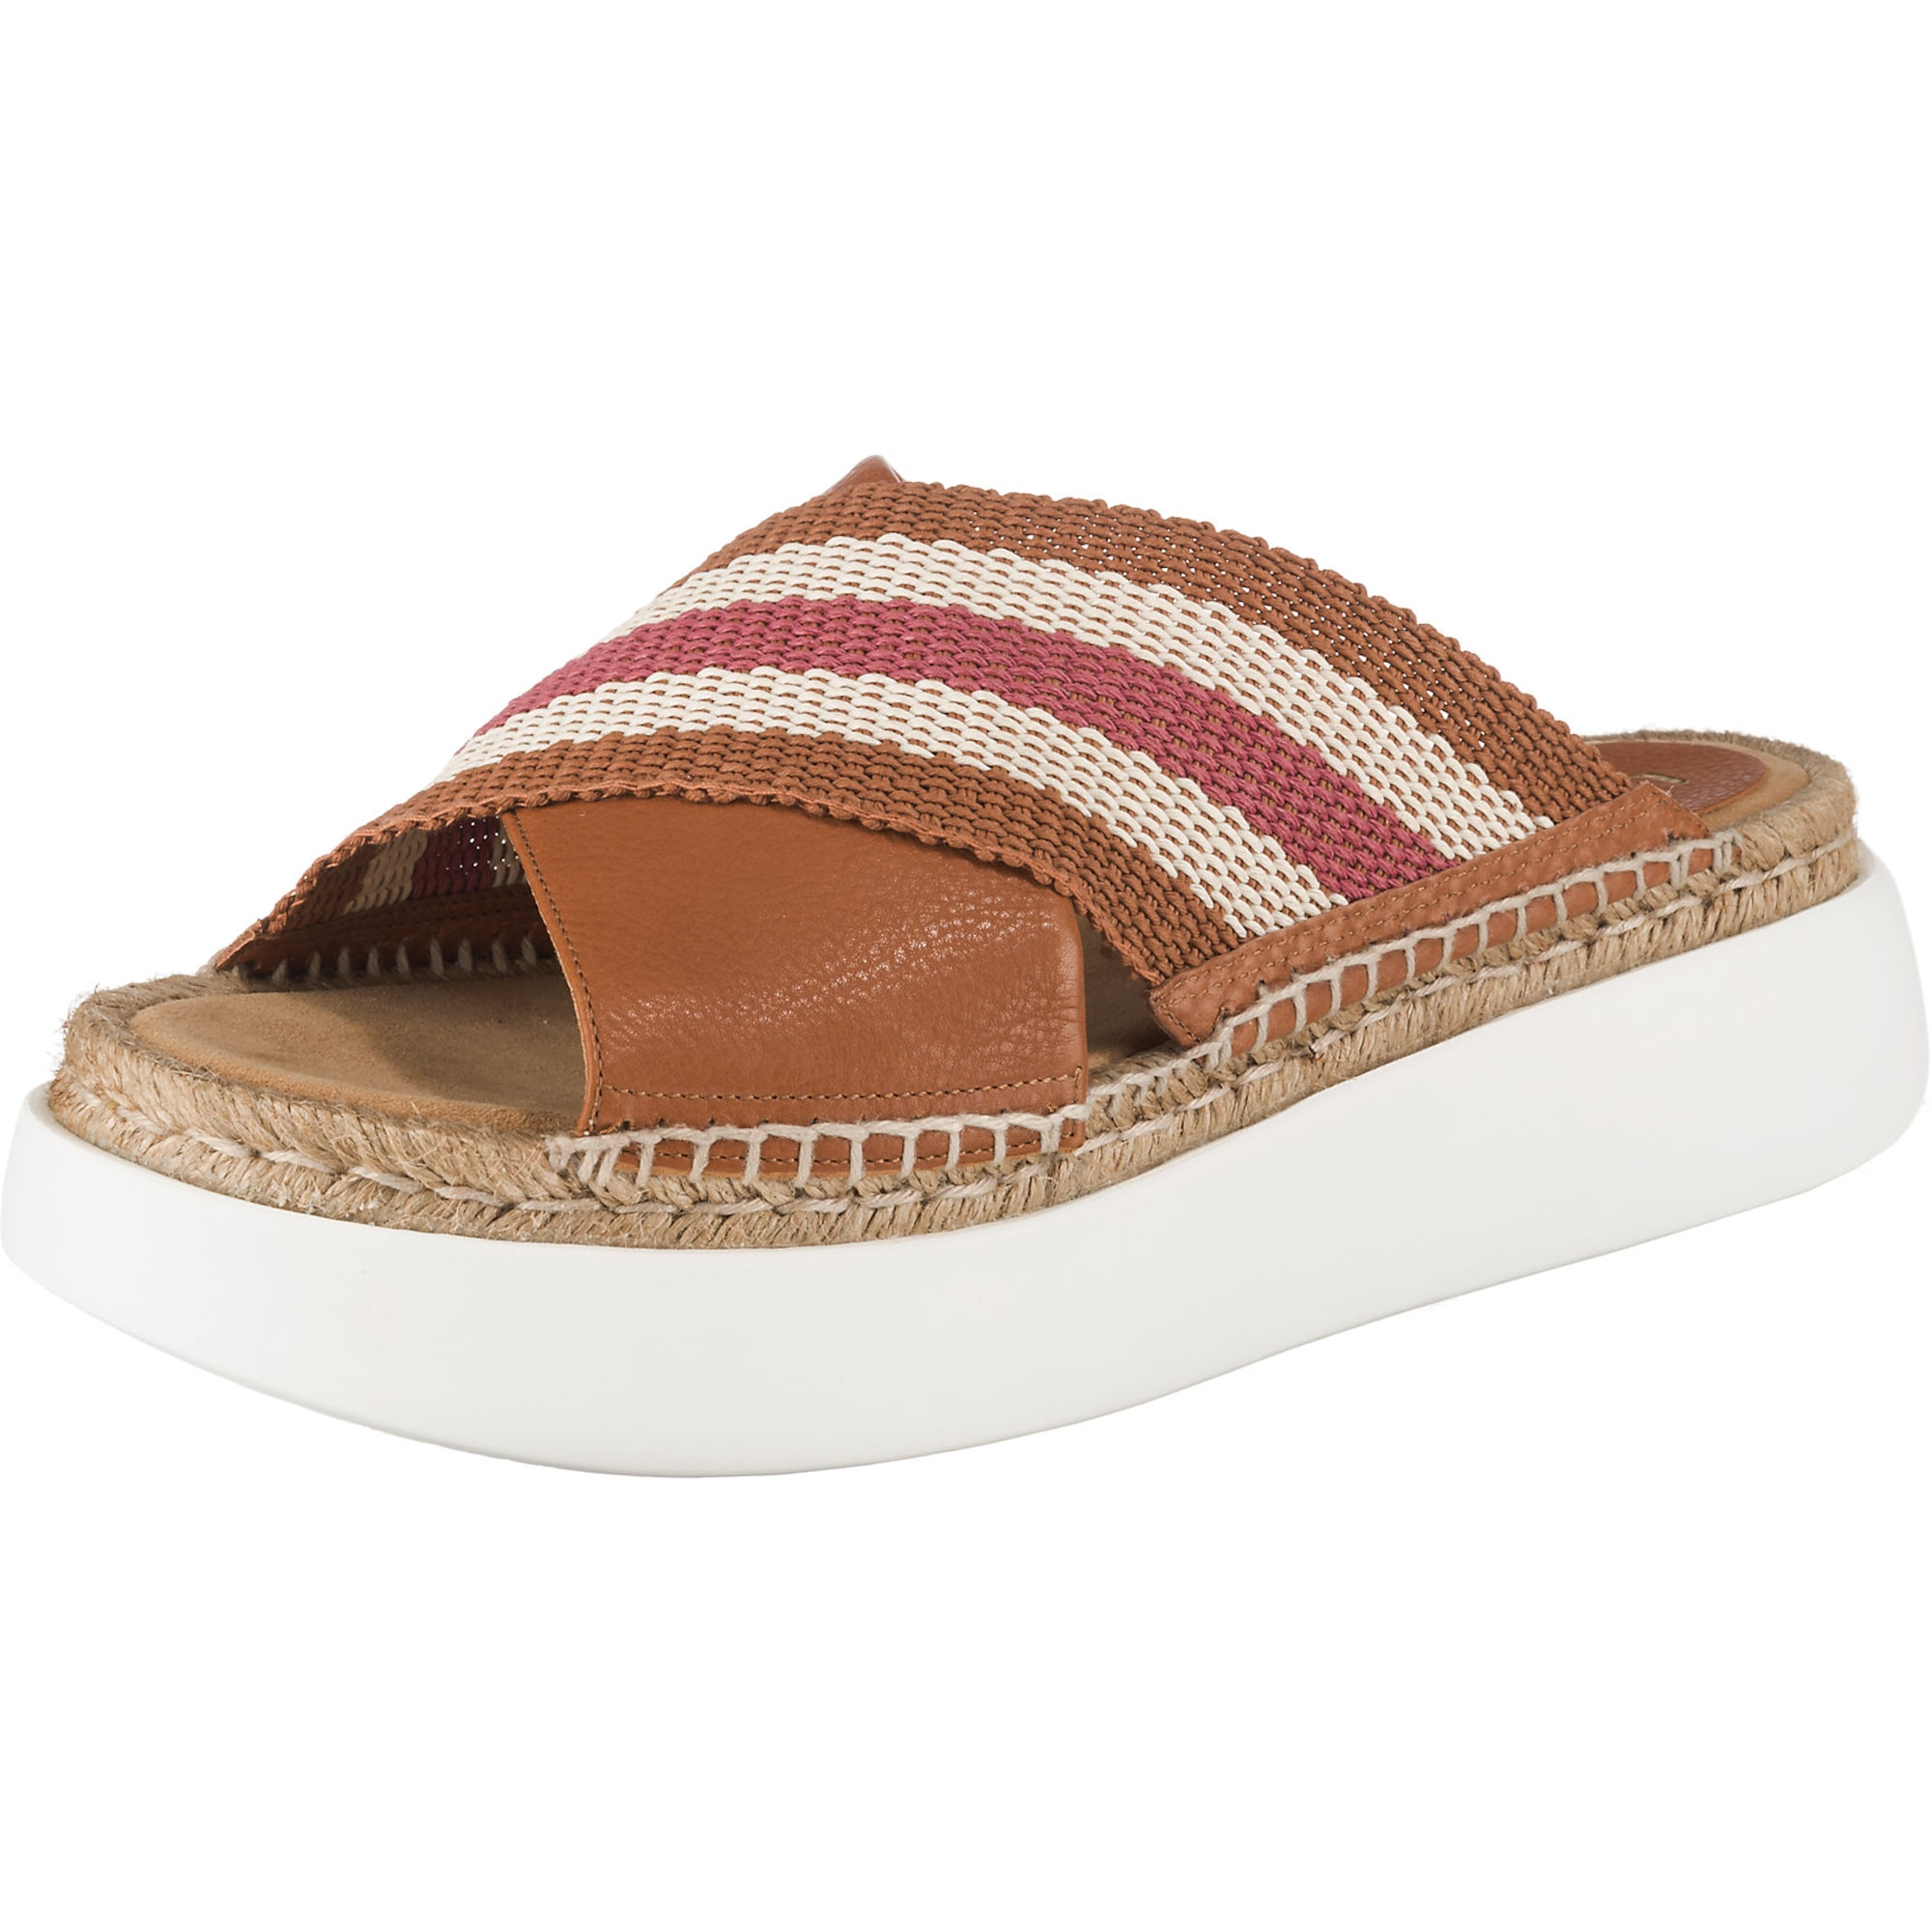 Pantoletten | Schuhe > Clogs & Pantoletten | Beige - Braun | Unisa